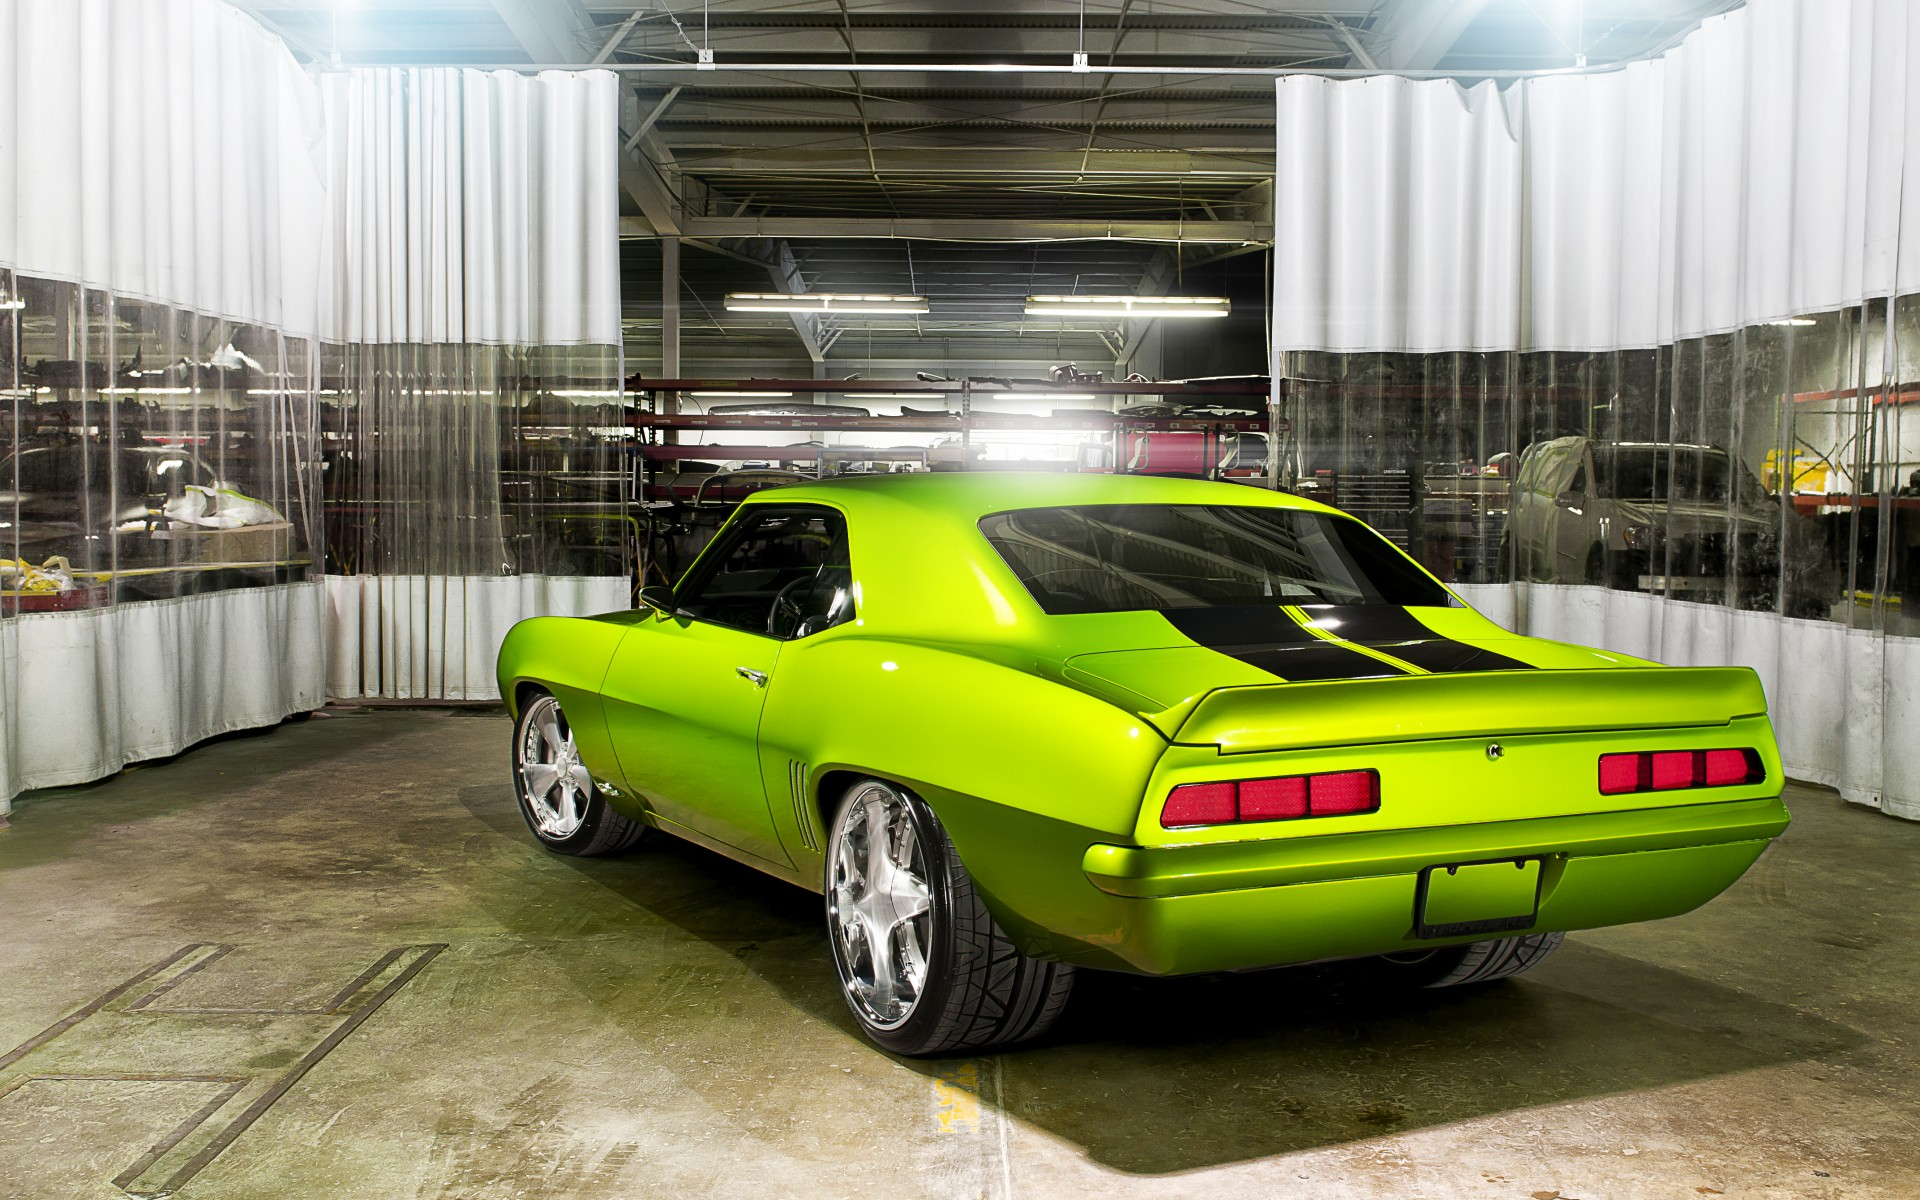 Custom Lowrider Muscle Cars 1920x1200